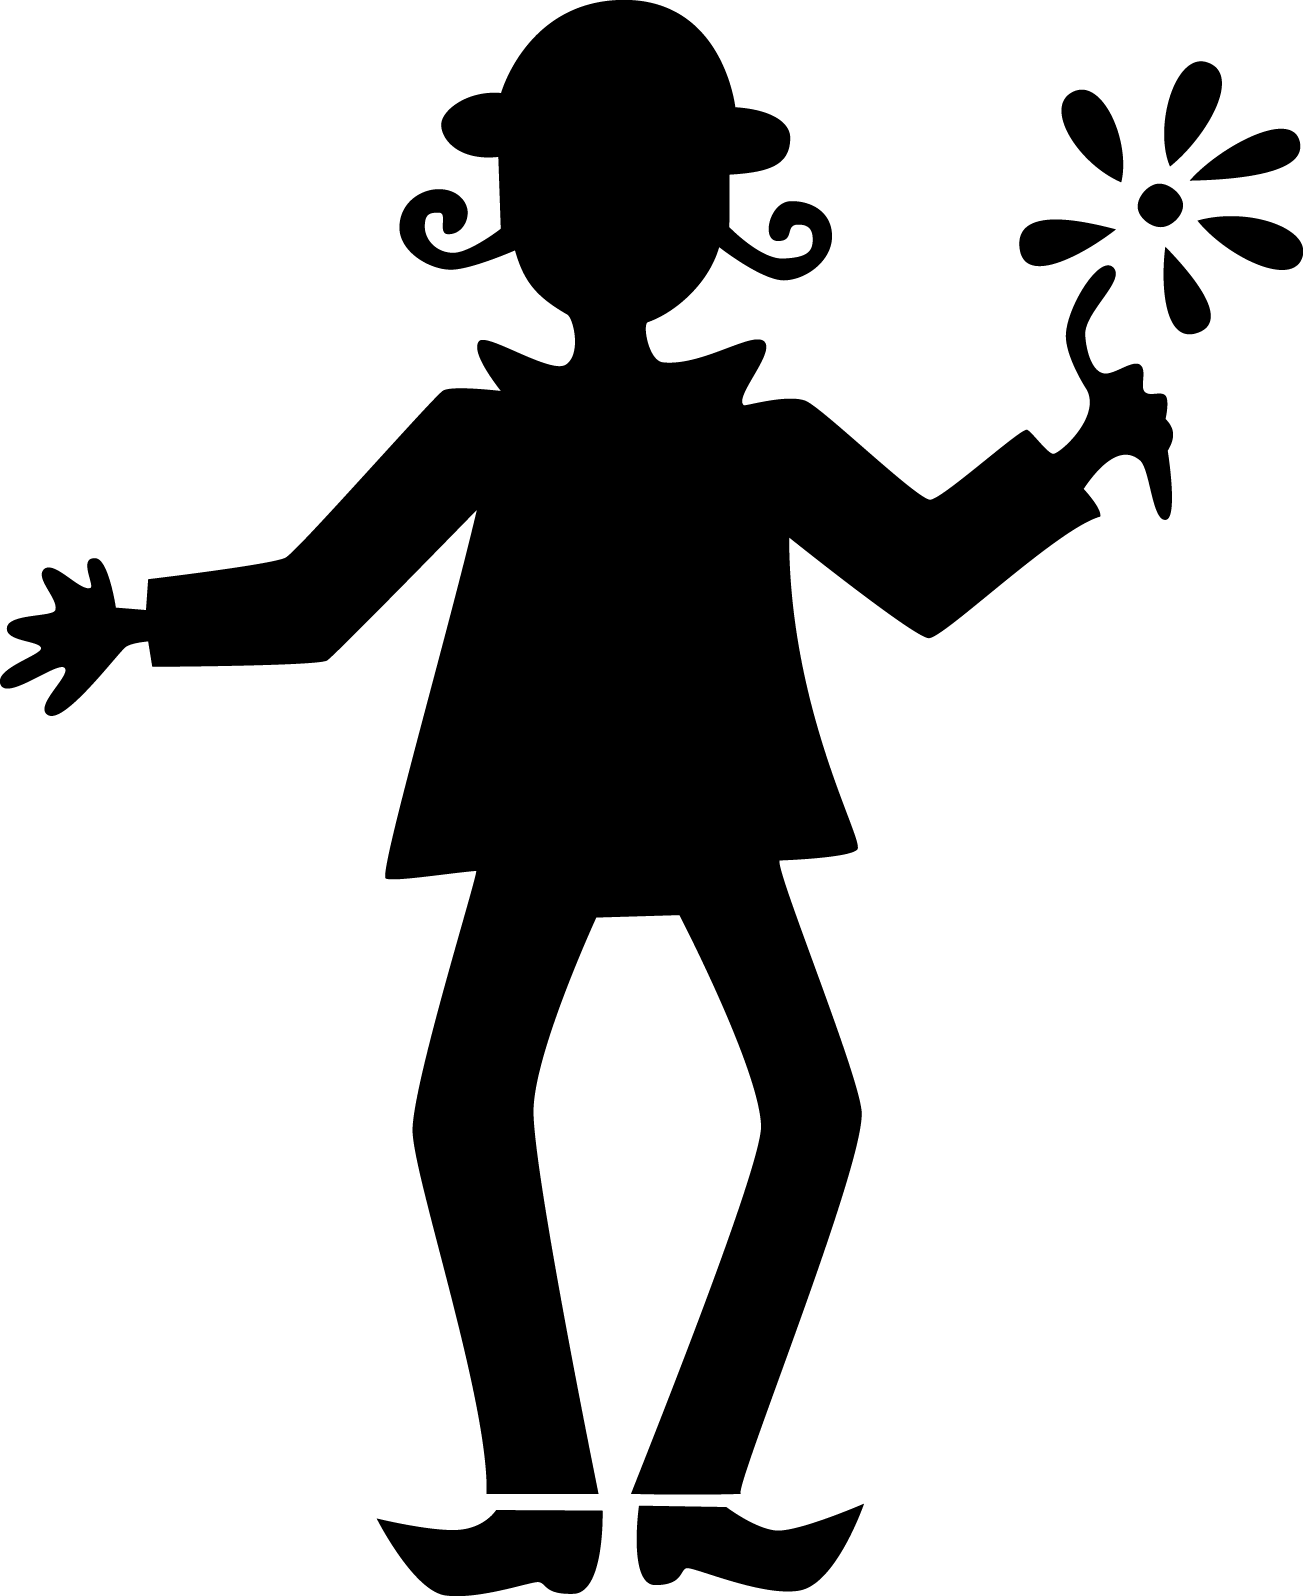 IC_Logo bonhomme.png